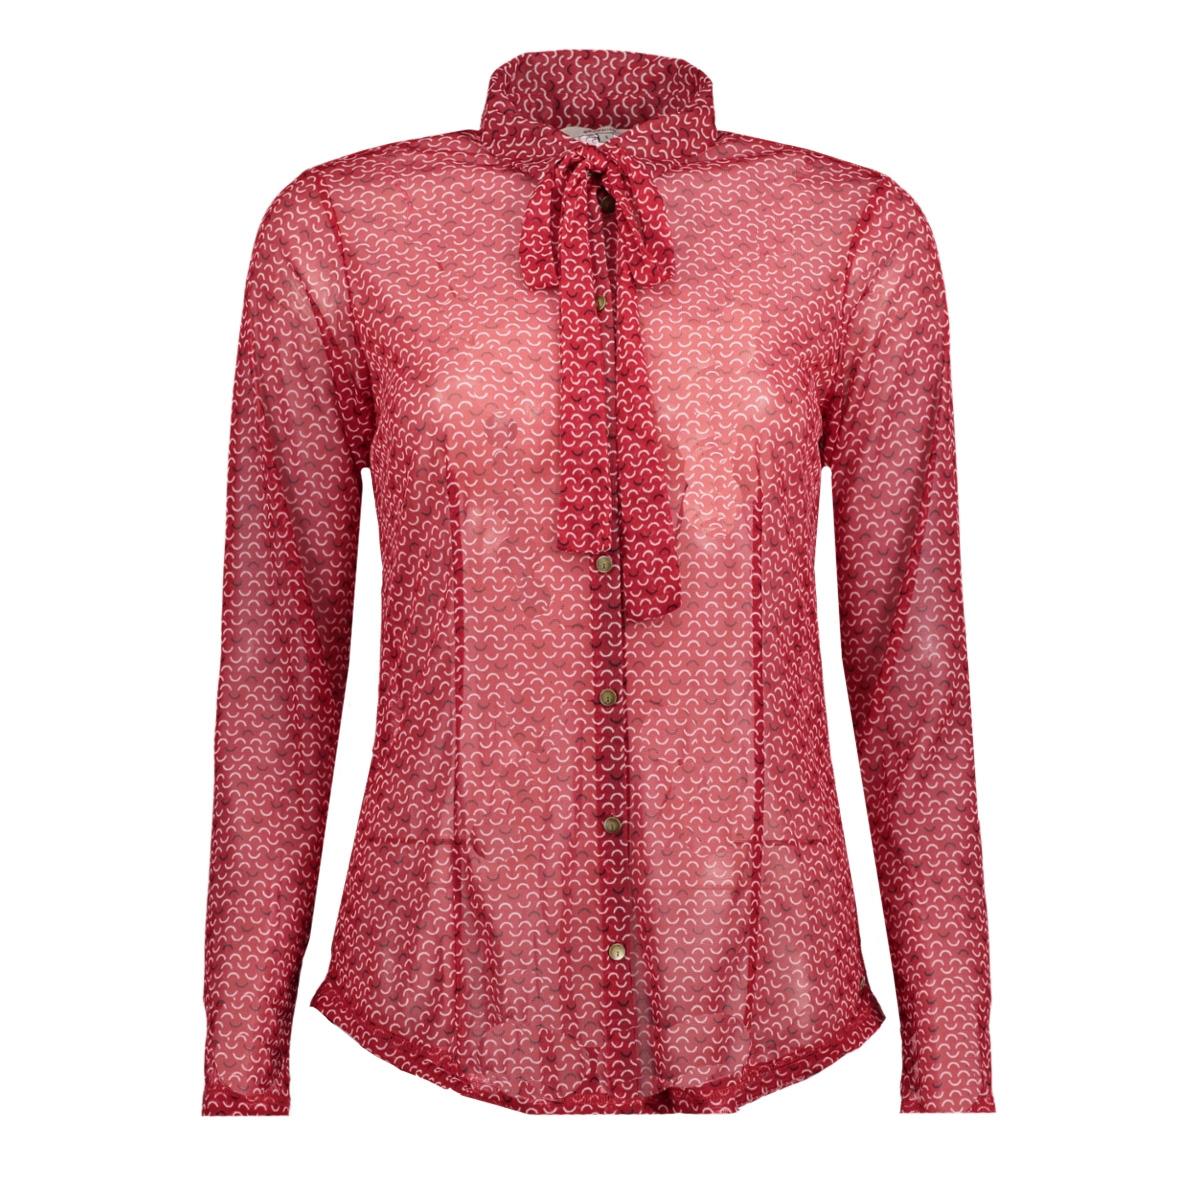 22001237 sandwich blouse 20114